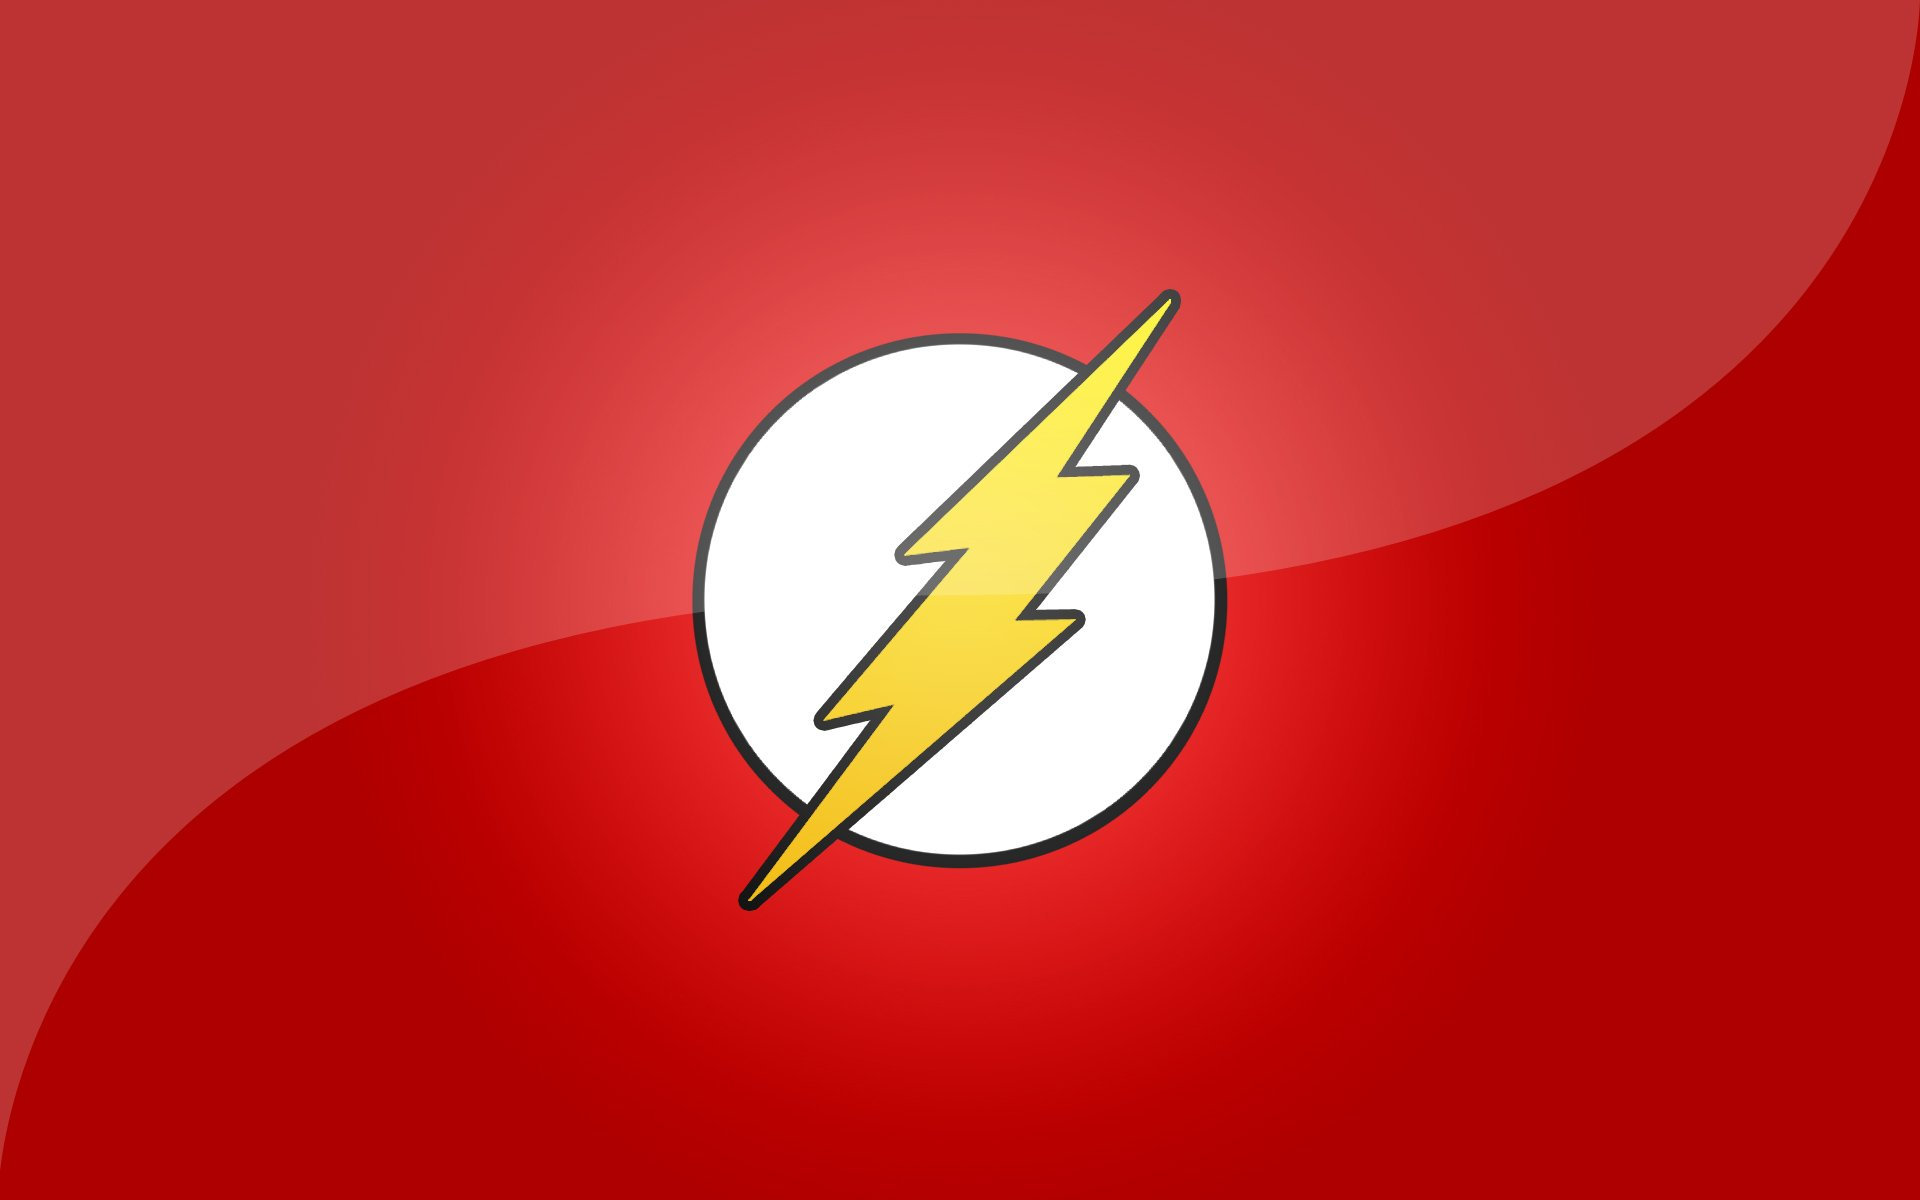 dc comics the flash logos flash superhero wallpaper 1920x1200 rh wallpaperup com dc logo wallpaper hd dc logo wallpaper hd